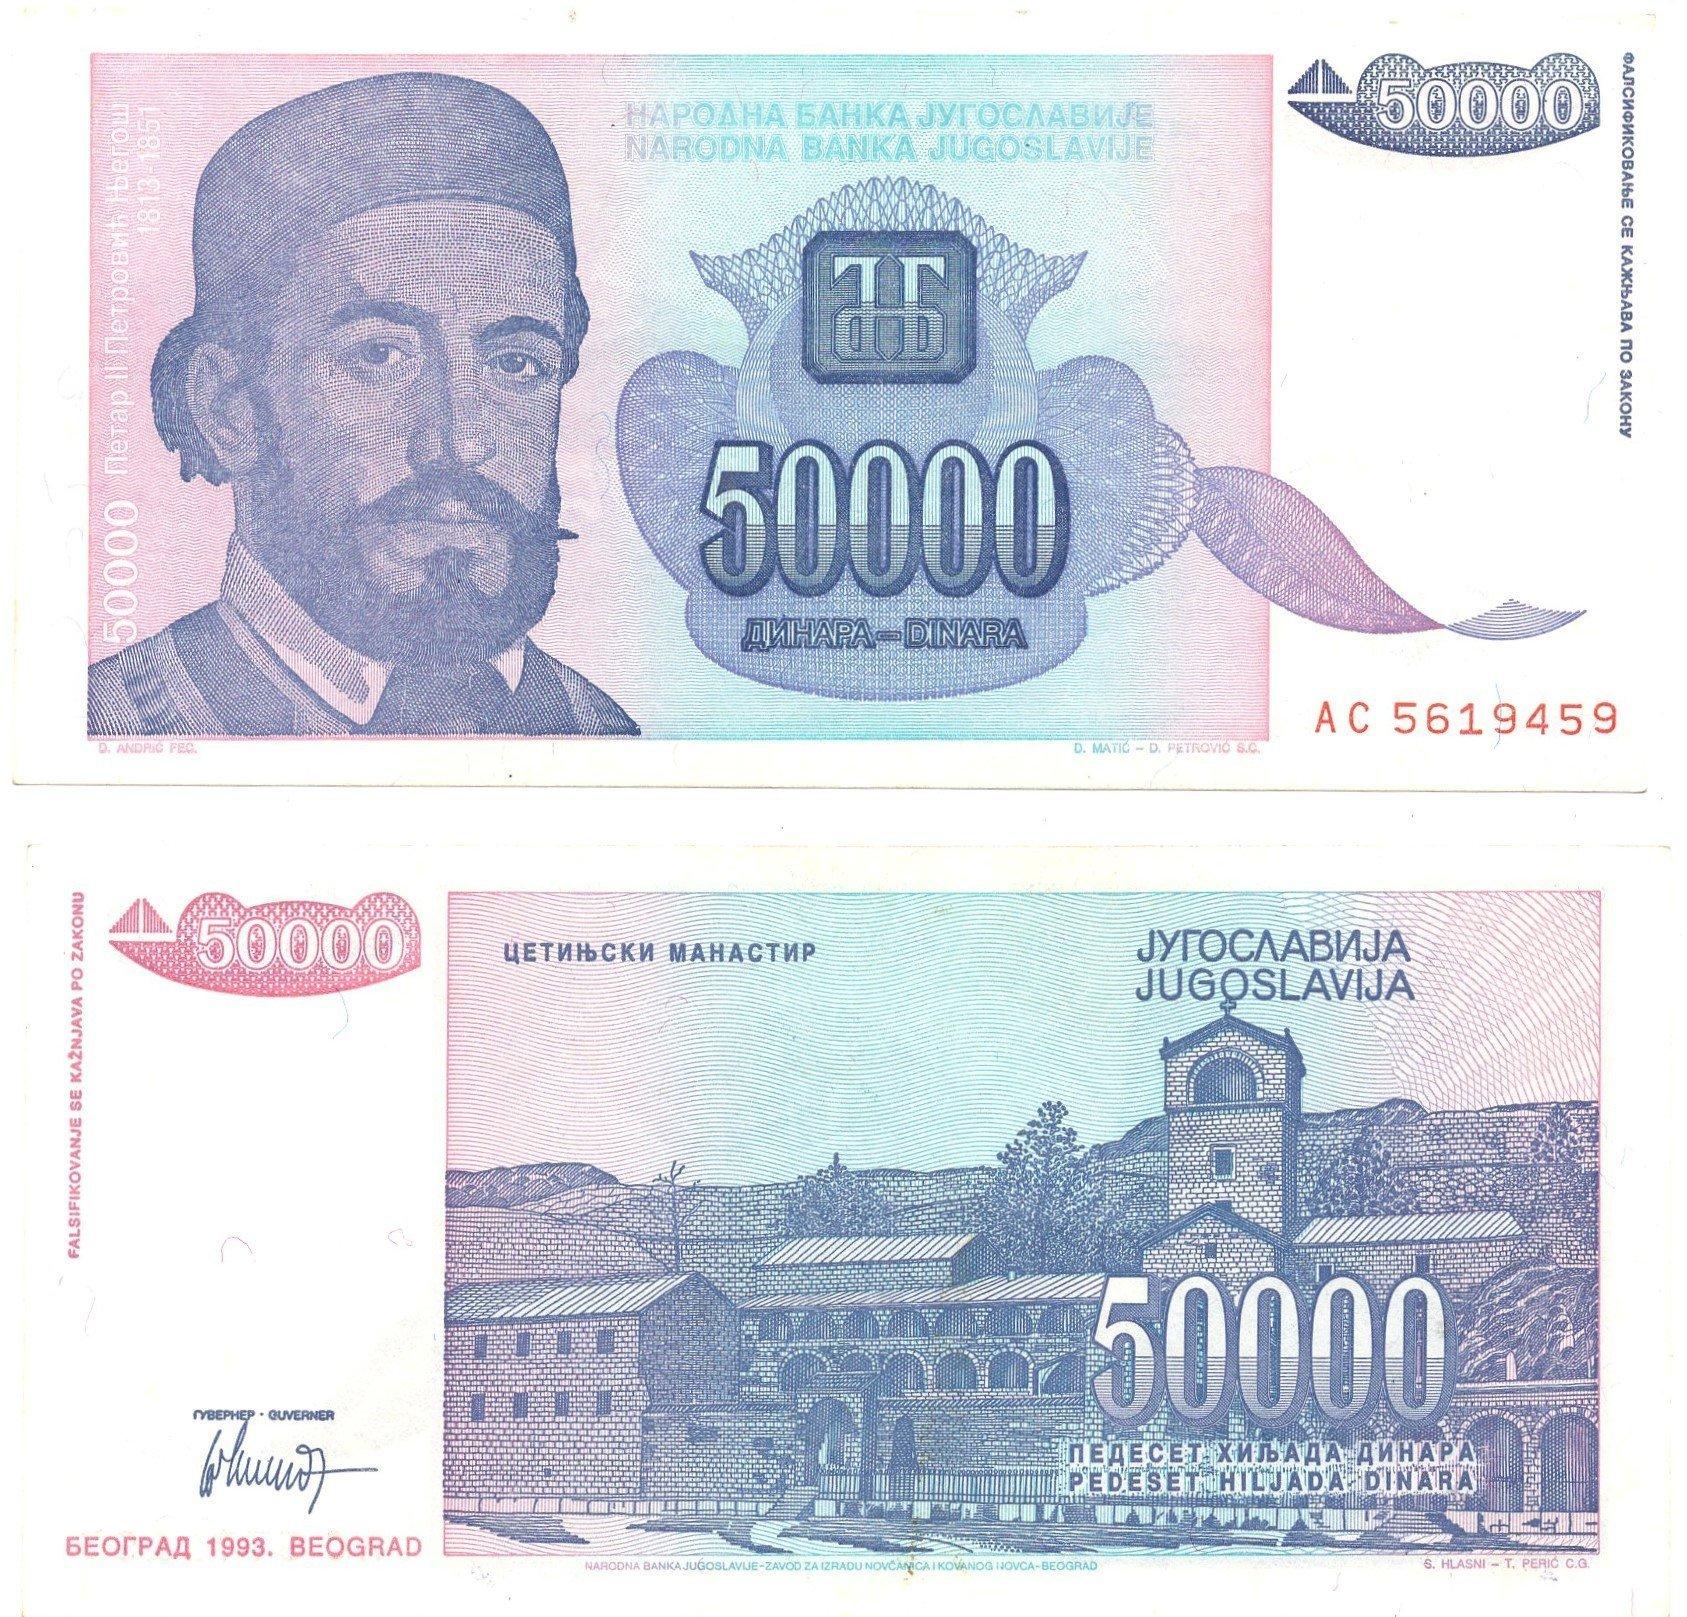 Yugoslavakia 50000 dinara 1993 banknote for sale